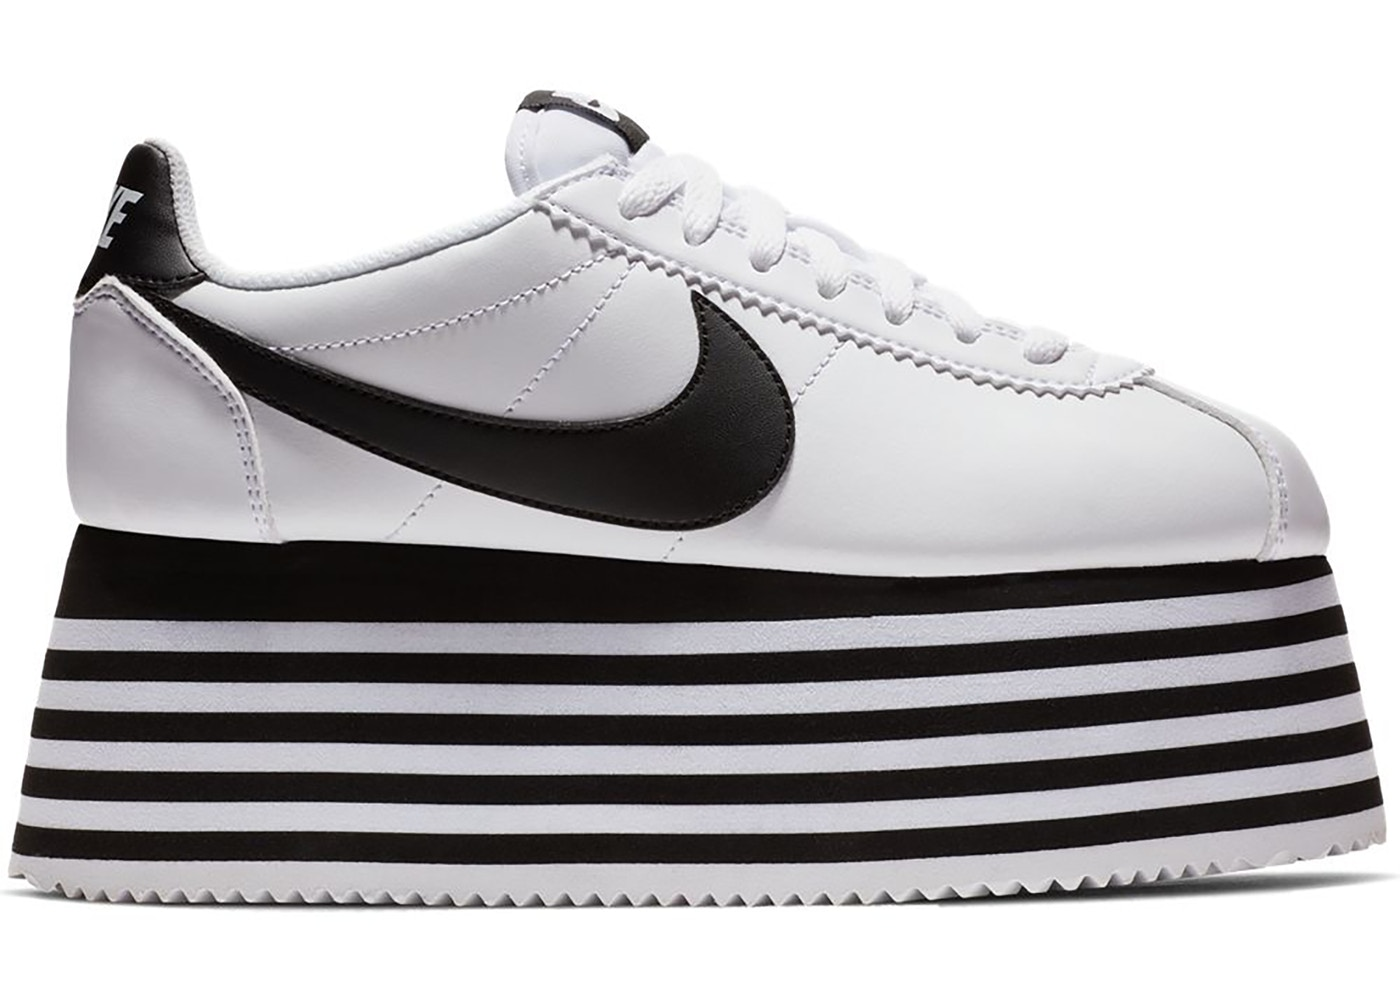 BlackW Cortez des Garcons White Nike Comme Platform l1JFc3TK